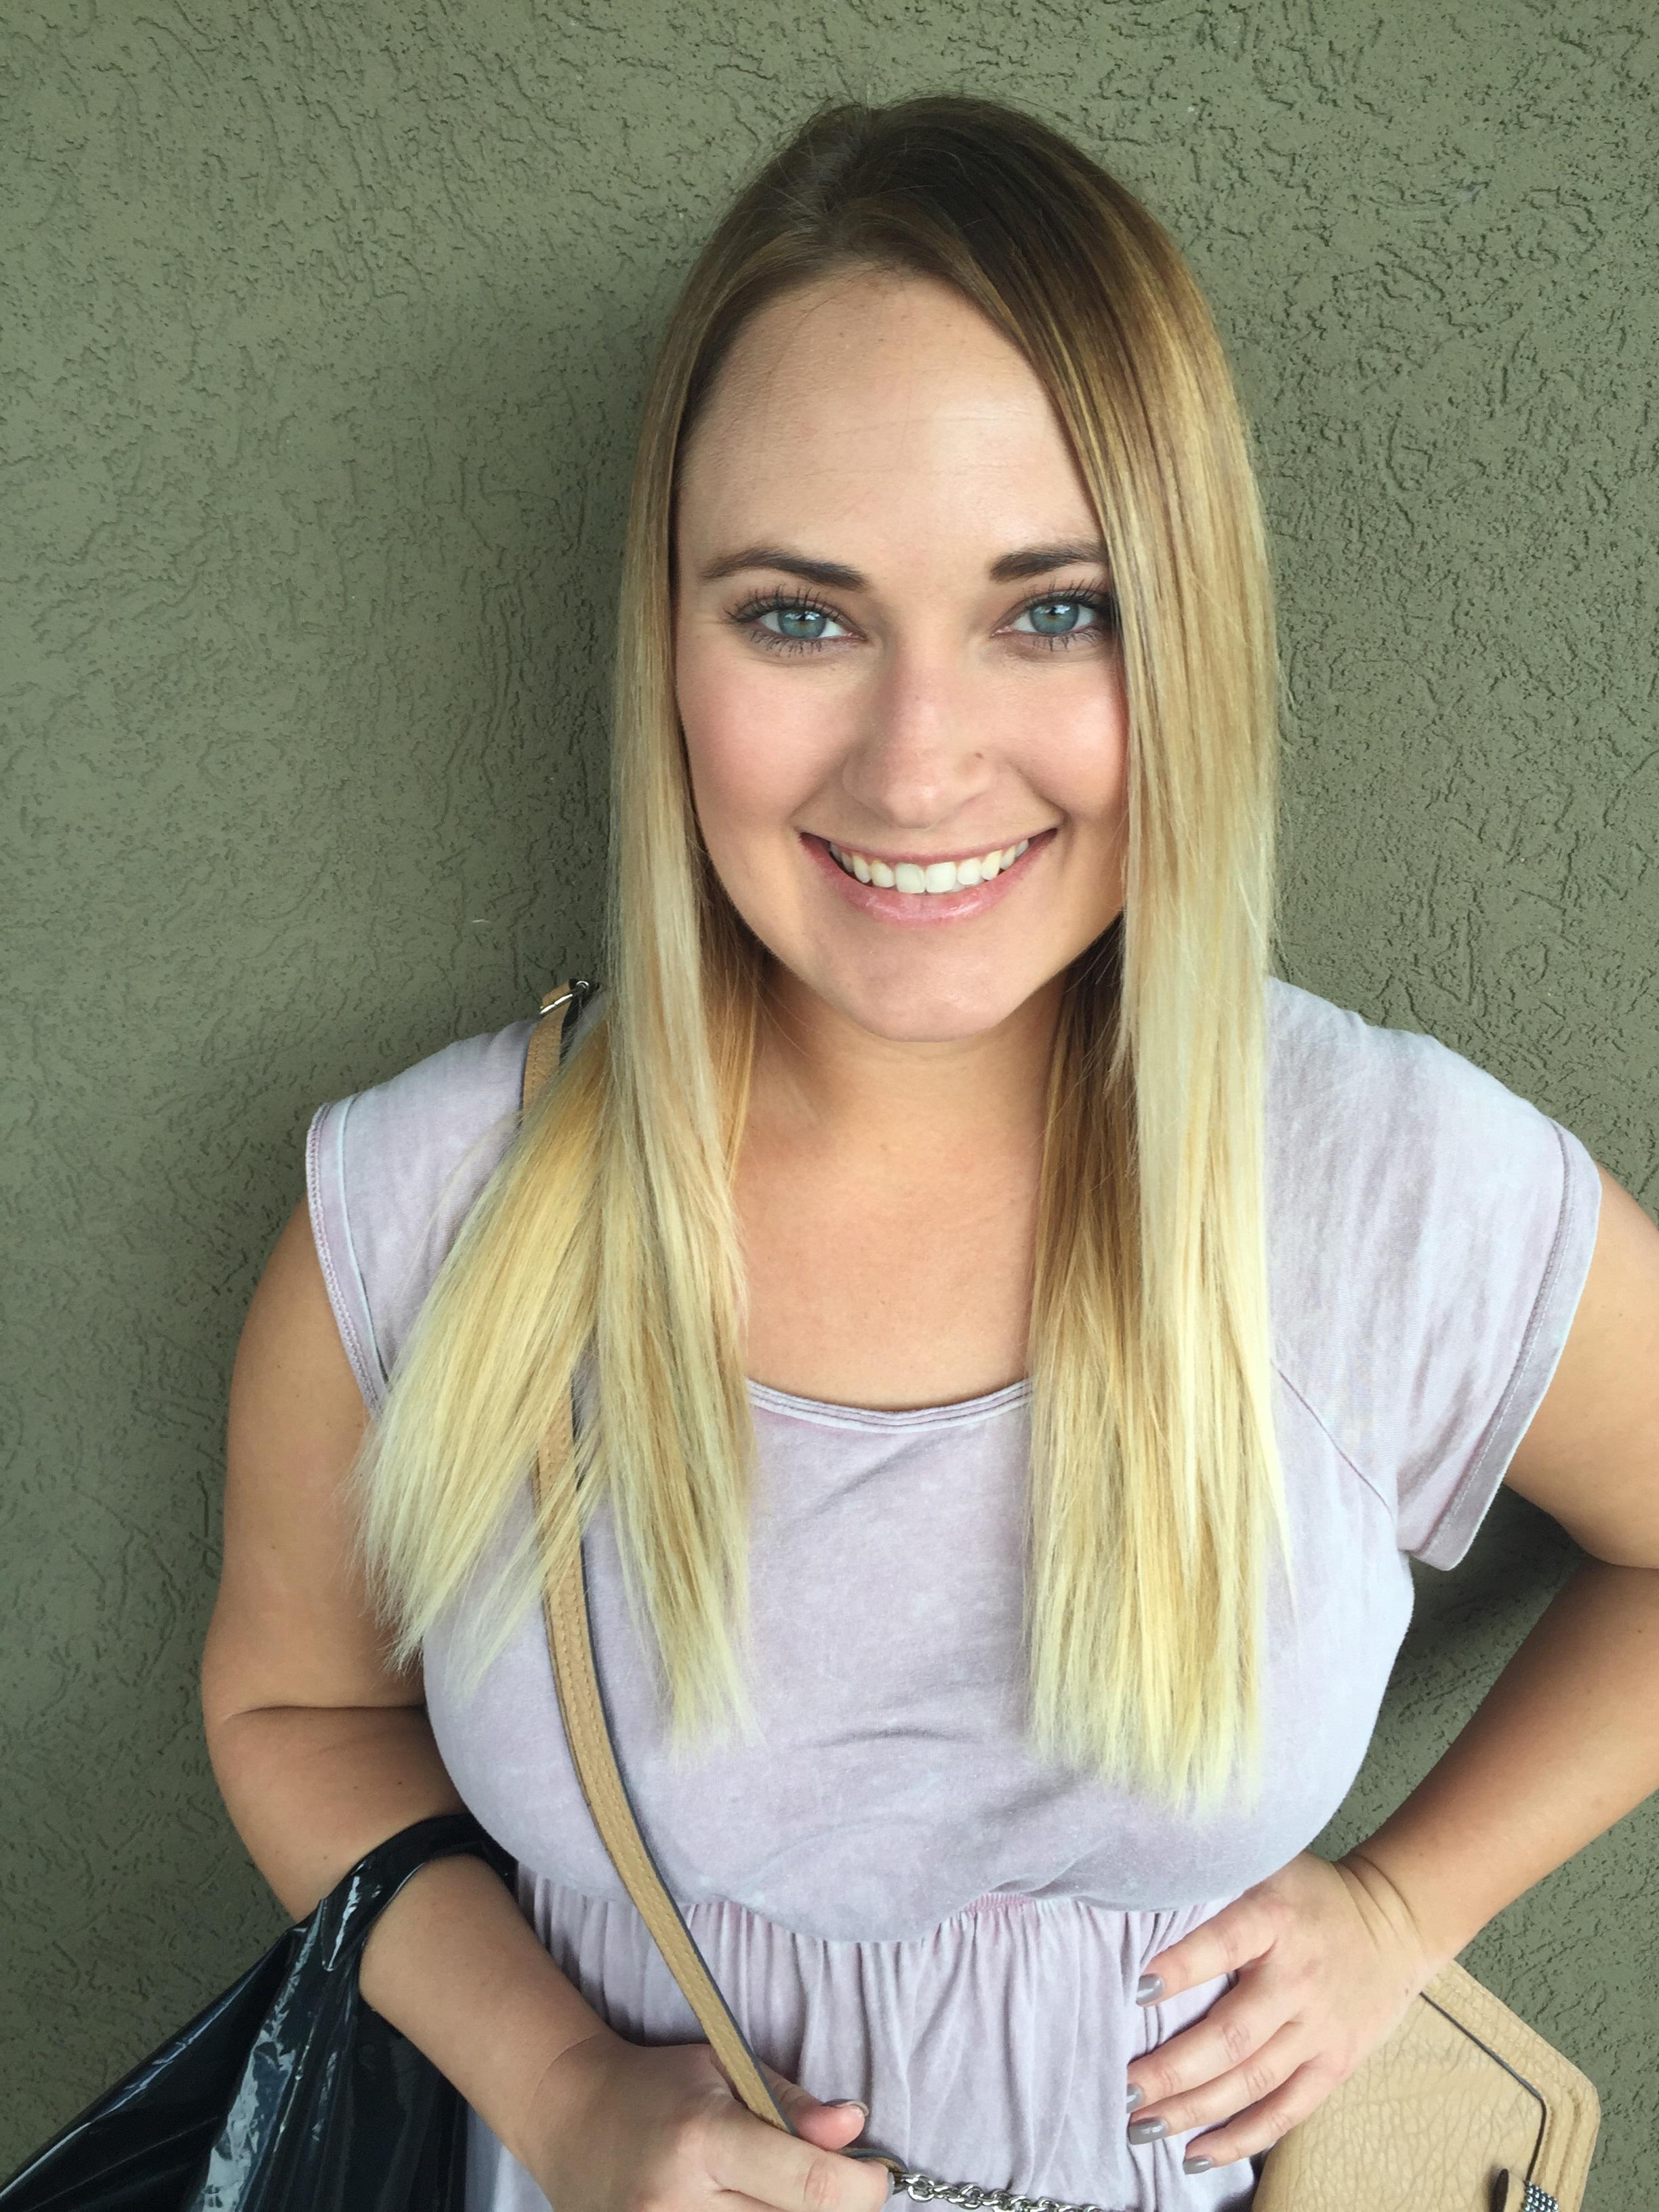 30vol Goldwell enlightener   Toner: Ice Scruples Power Blonde